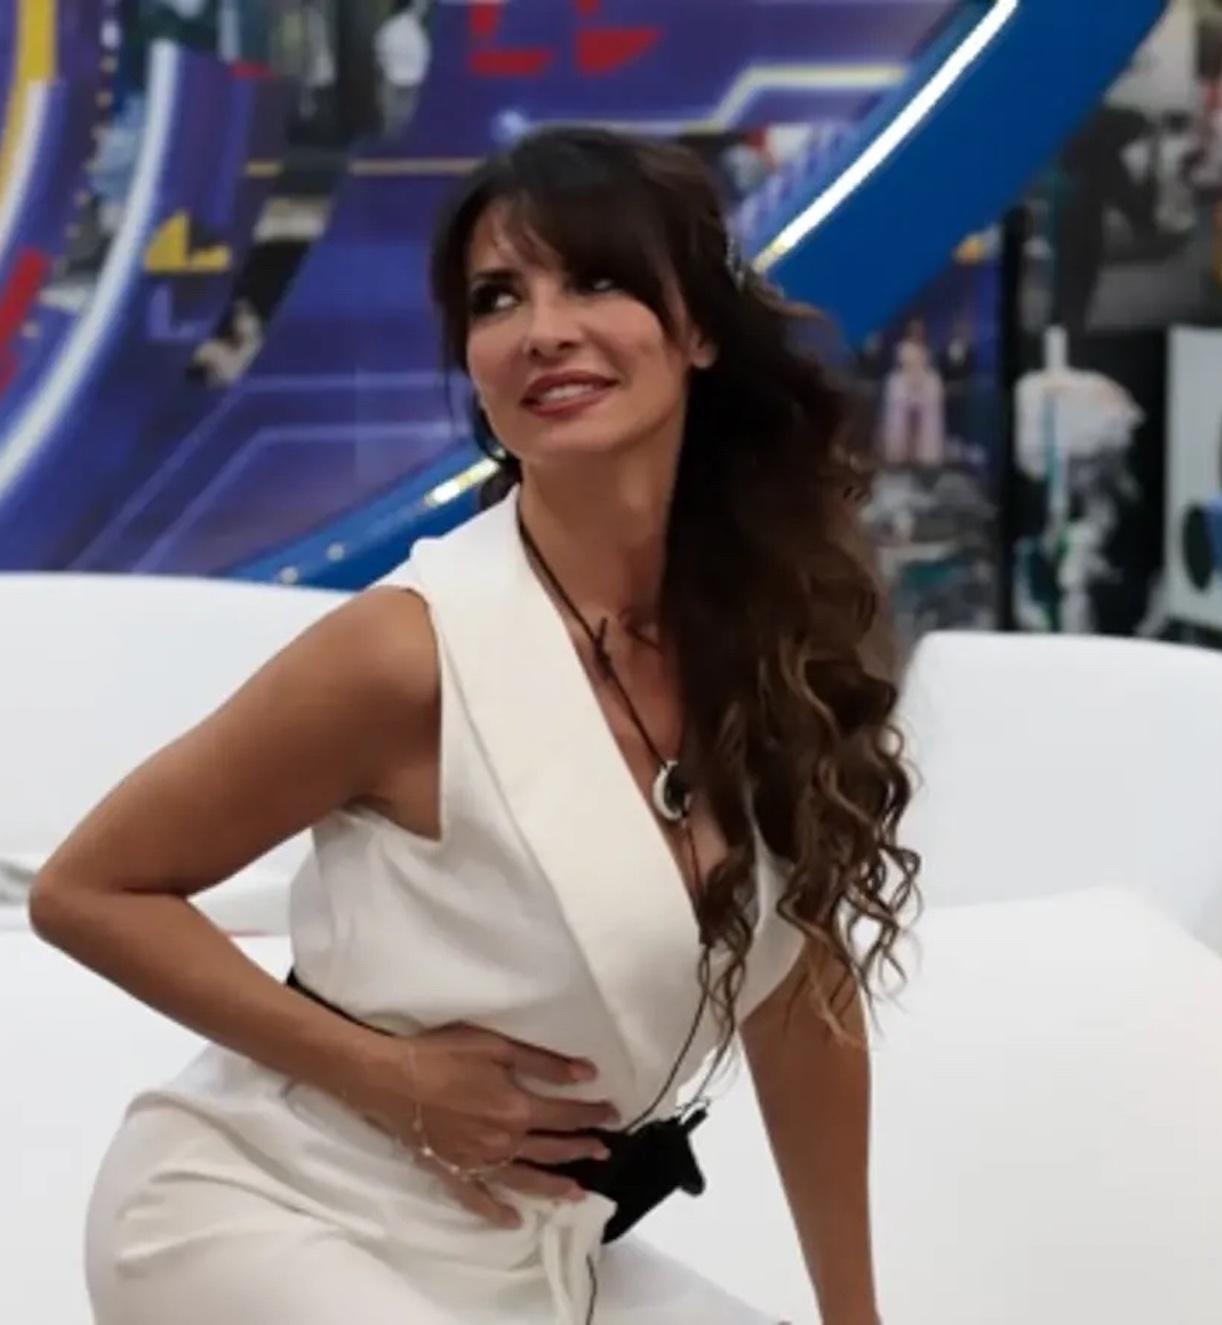 Katia Ricciarelli contro miriana trevisan gatta morta